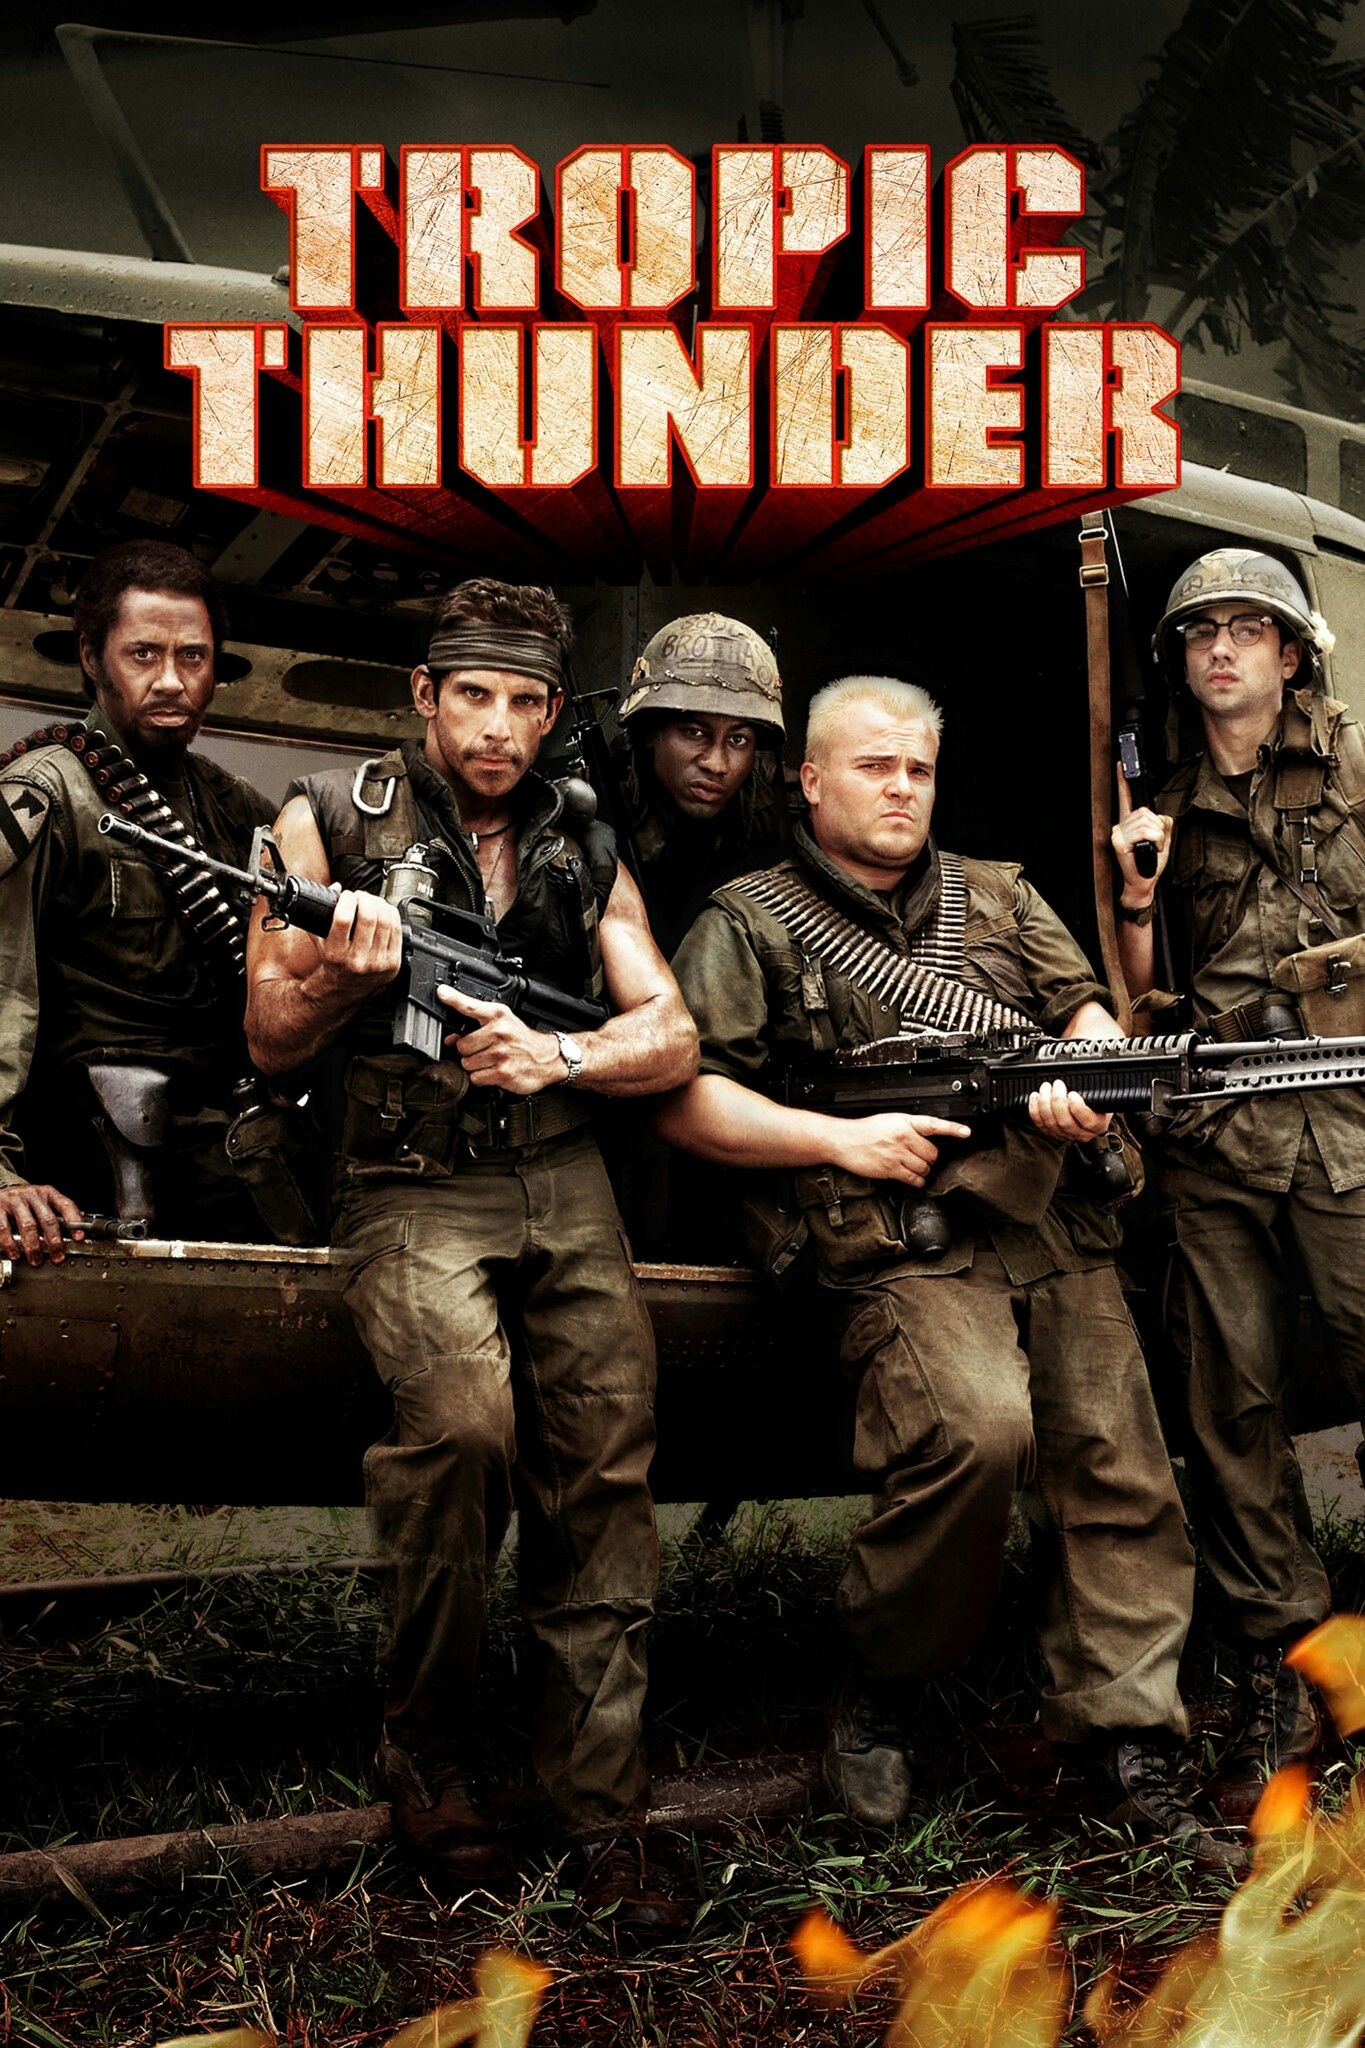 Tropic Thunder 2008 Movie Poster Cast Robert Downey Jr Ben Stiller Brandon T Jackson Jack Tropic Thunder Movie Movie Business Full Movies Online Free